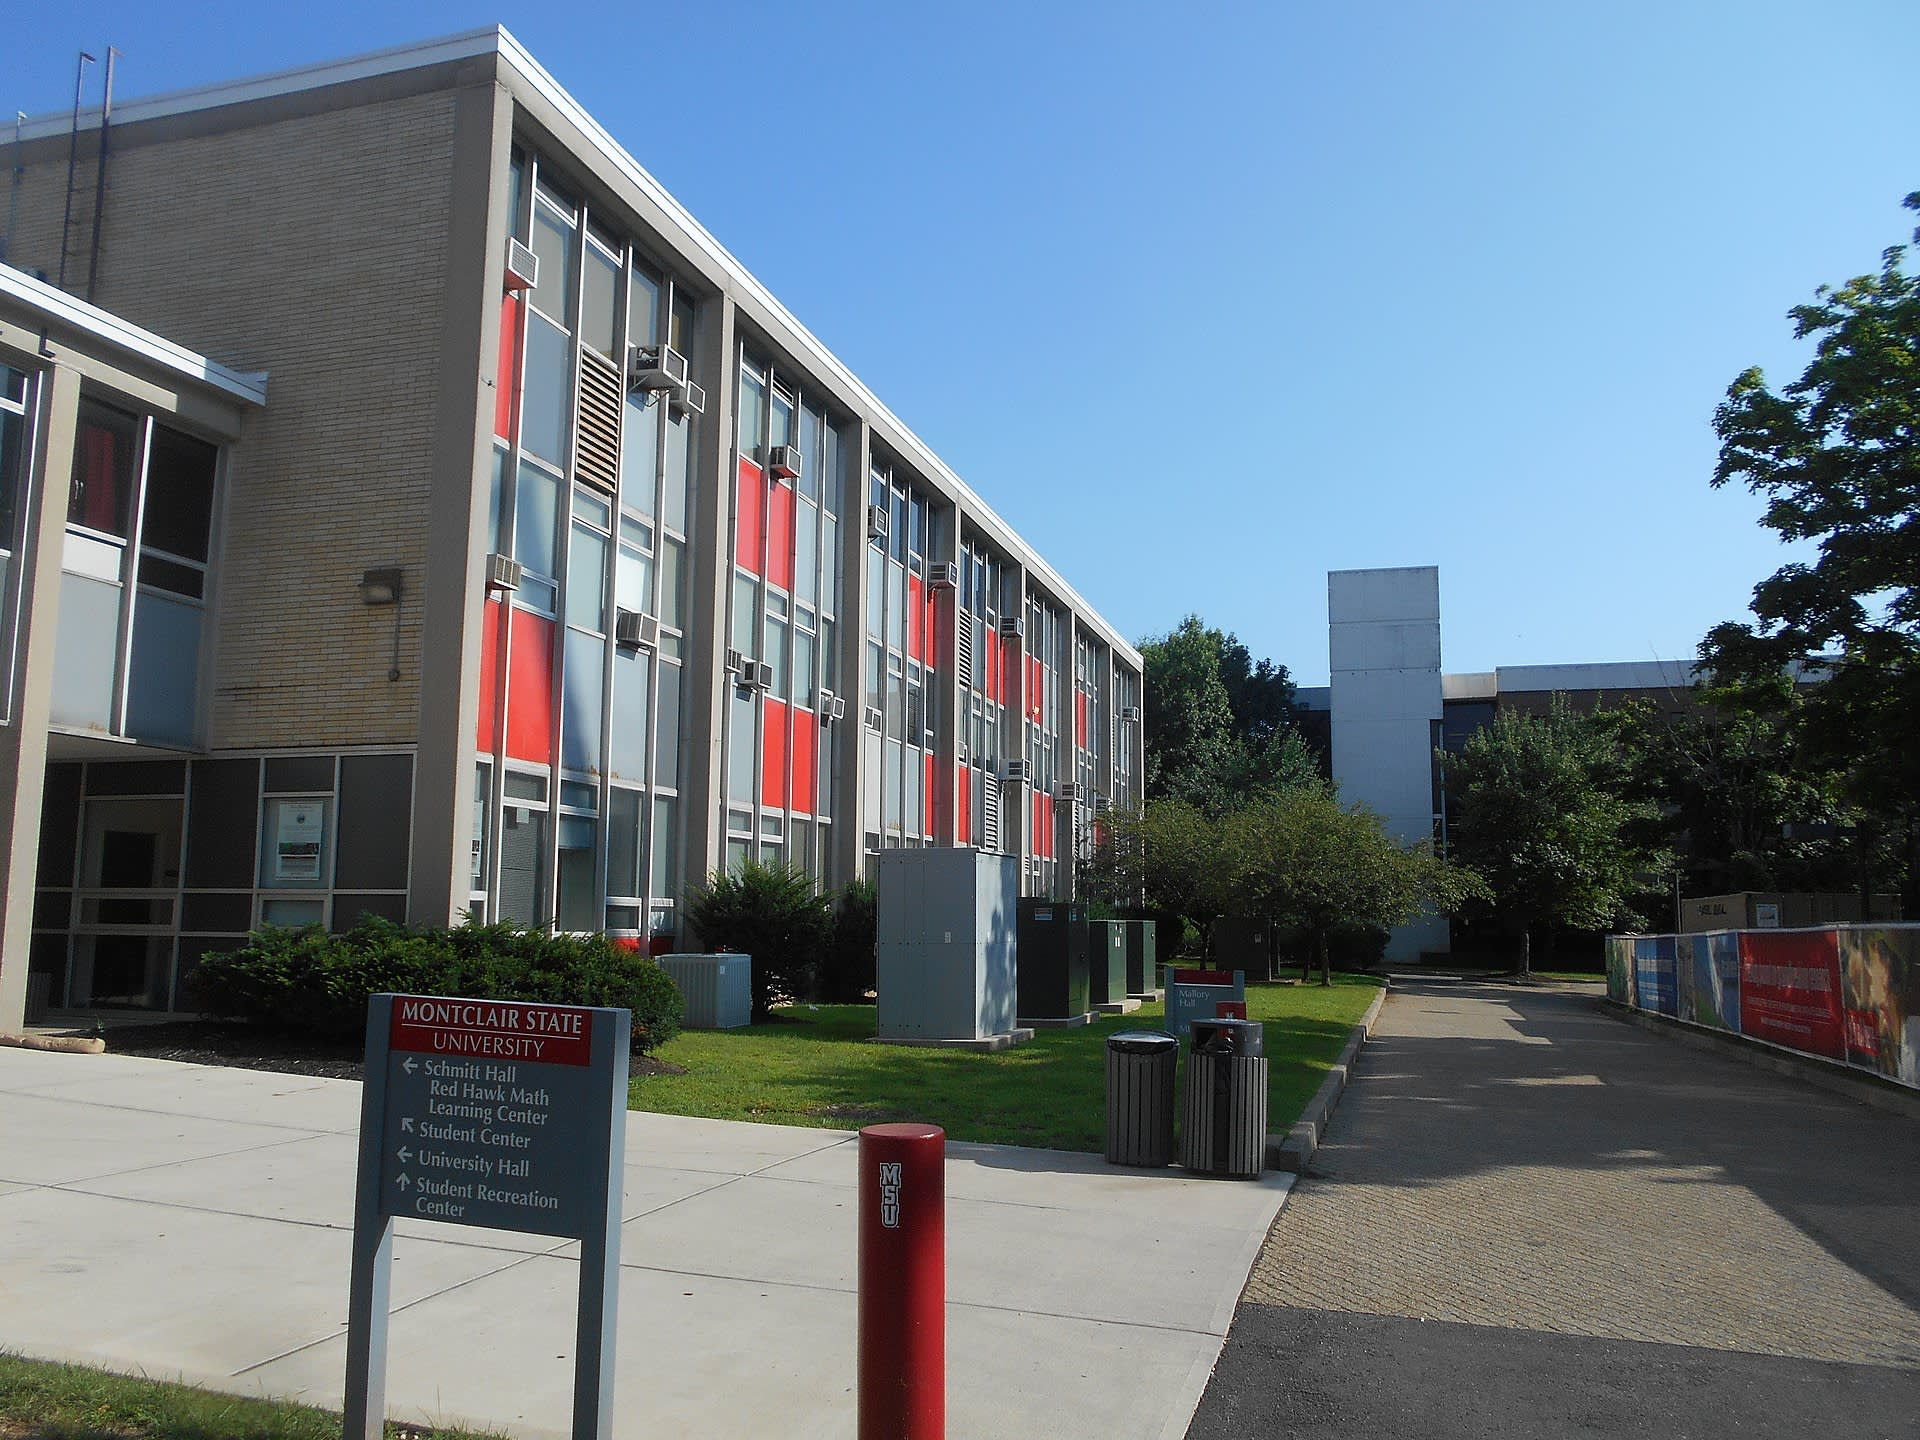 CC: Montclair State University